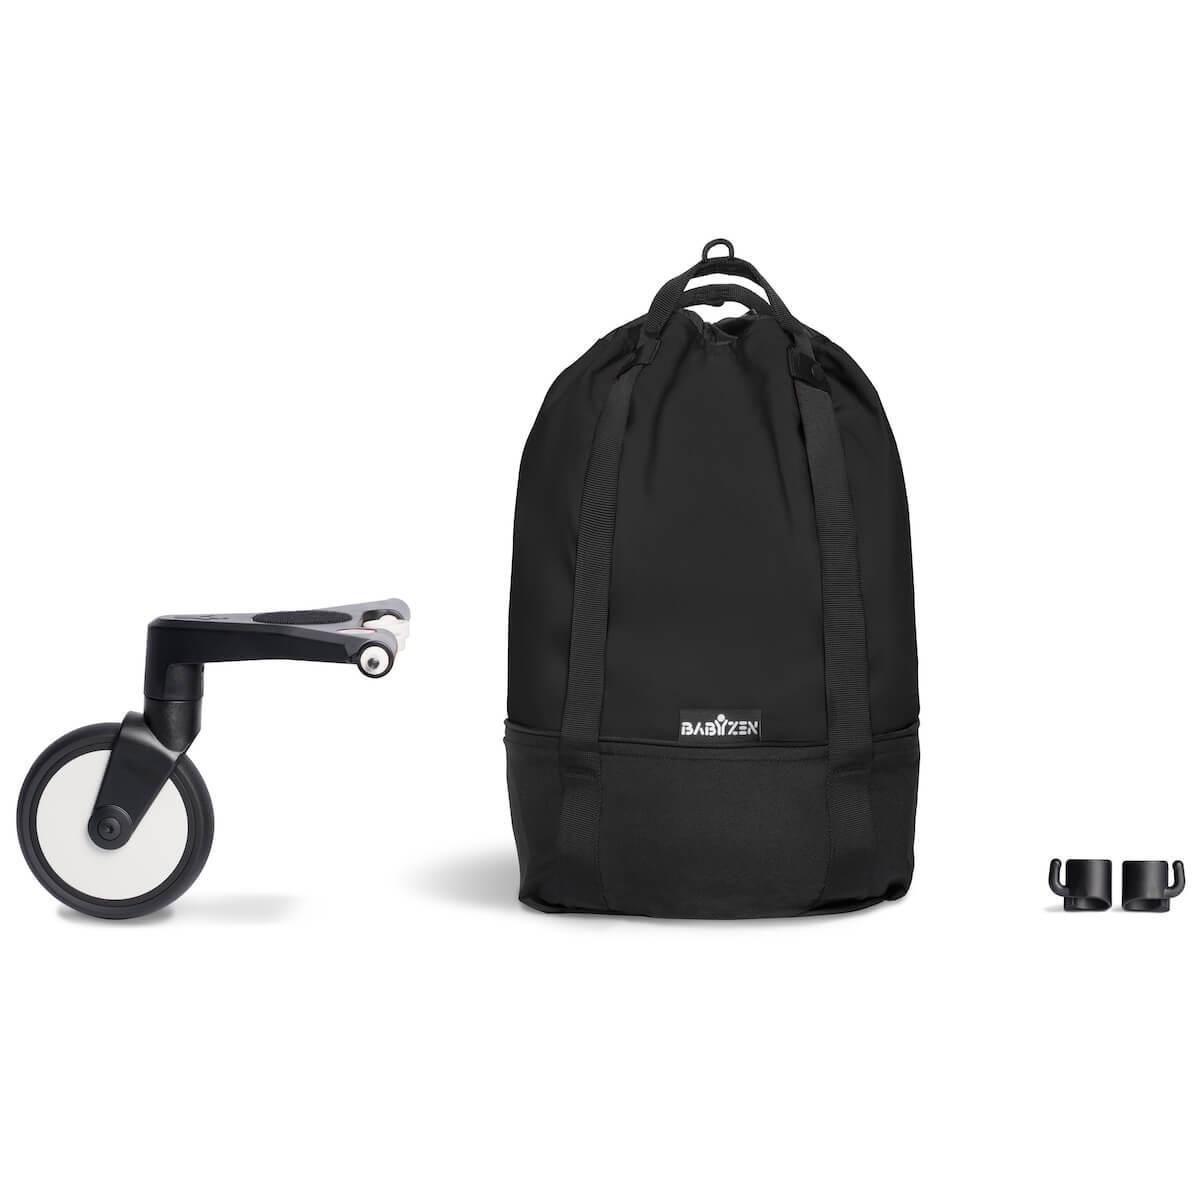 YOYO bag BABYZEN Black